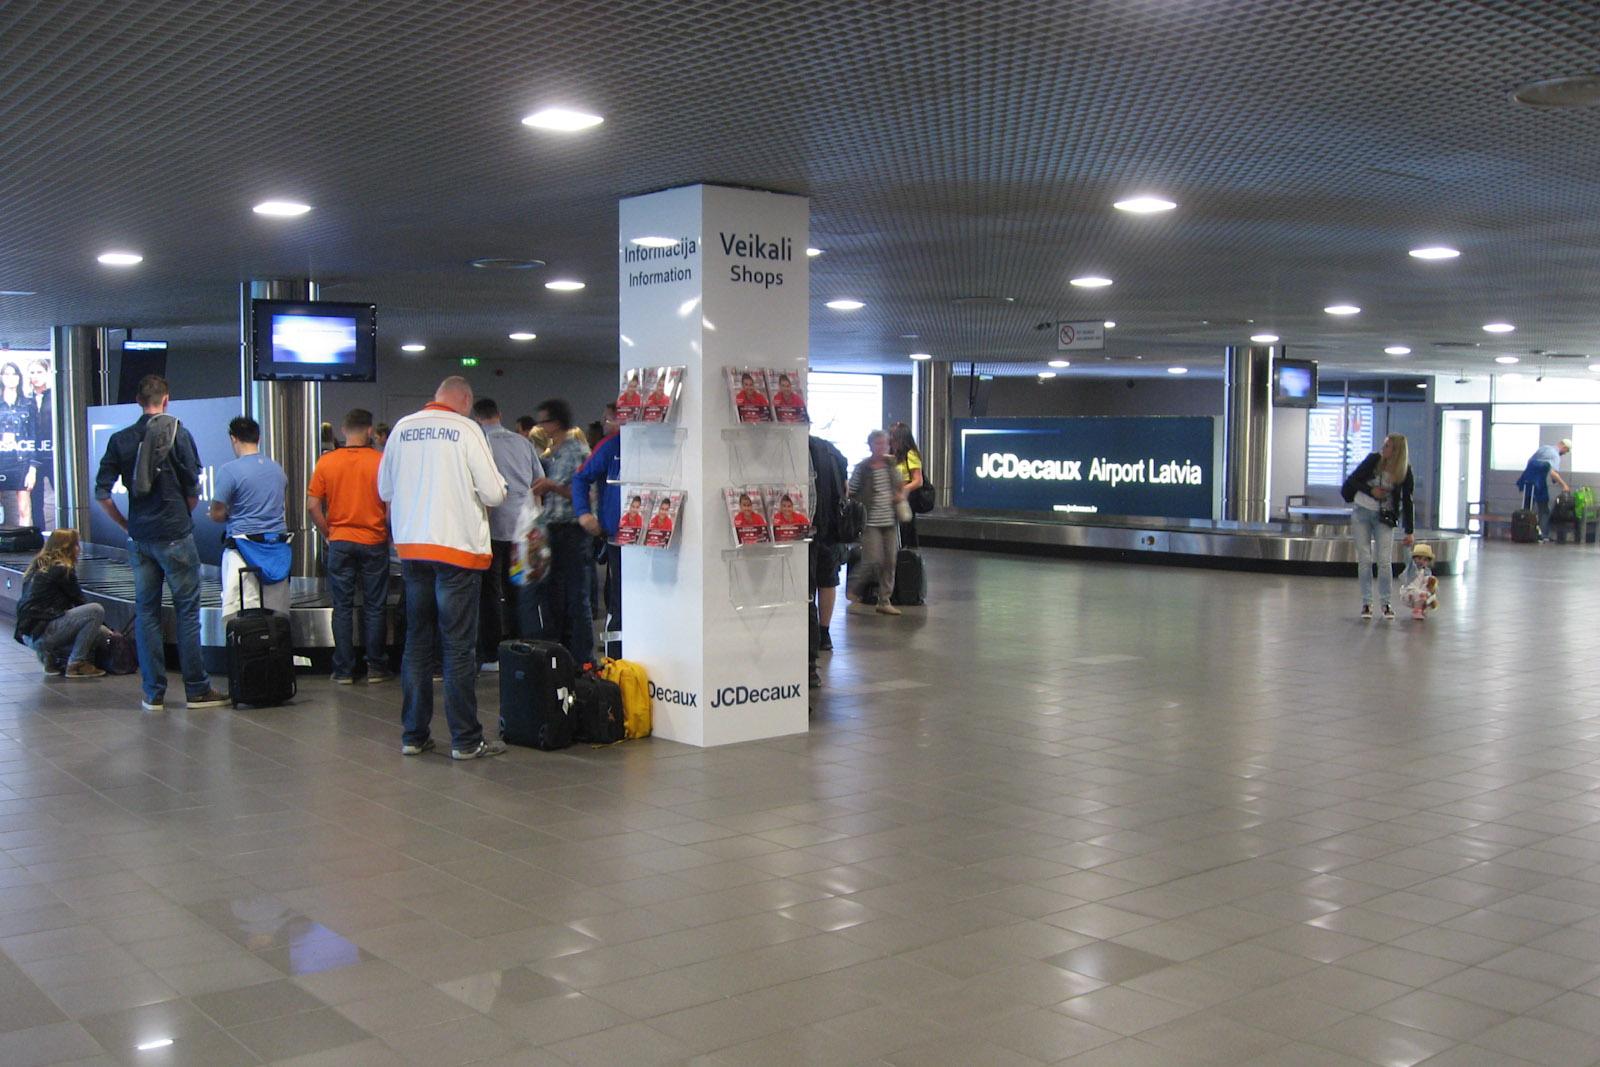 Зал выдачи багажа в аэропорту Рига